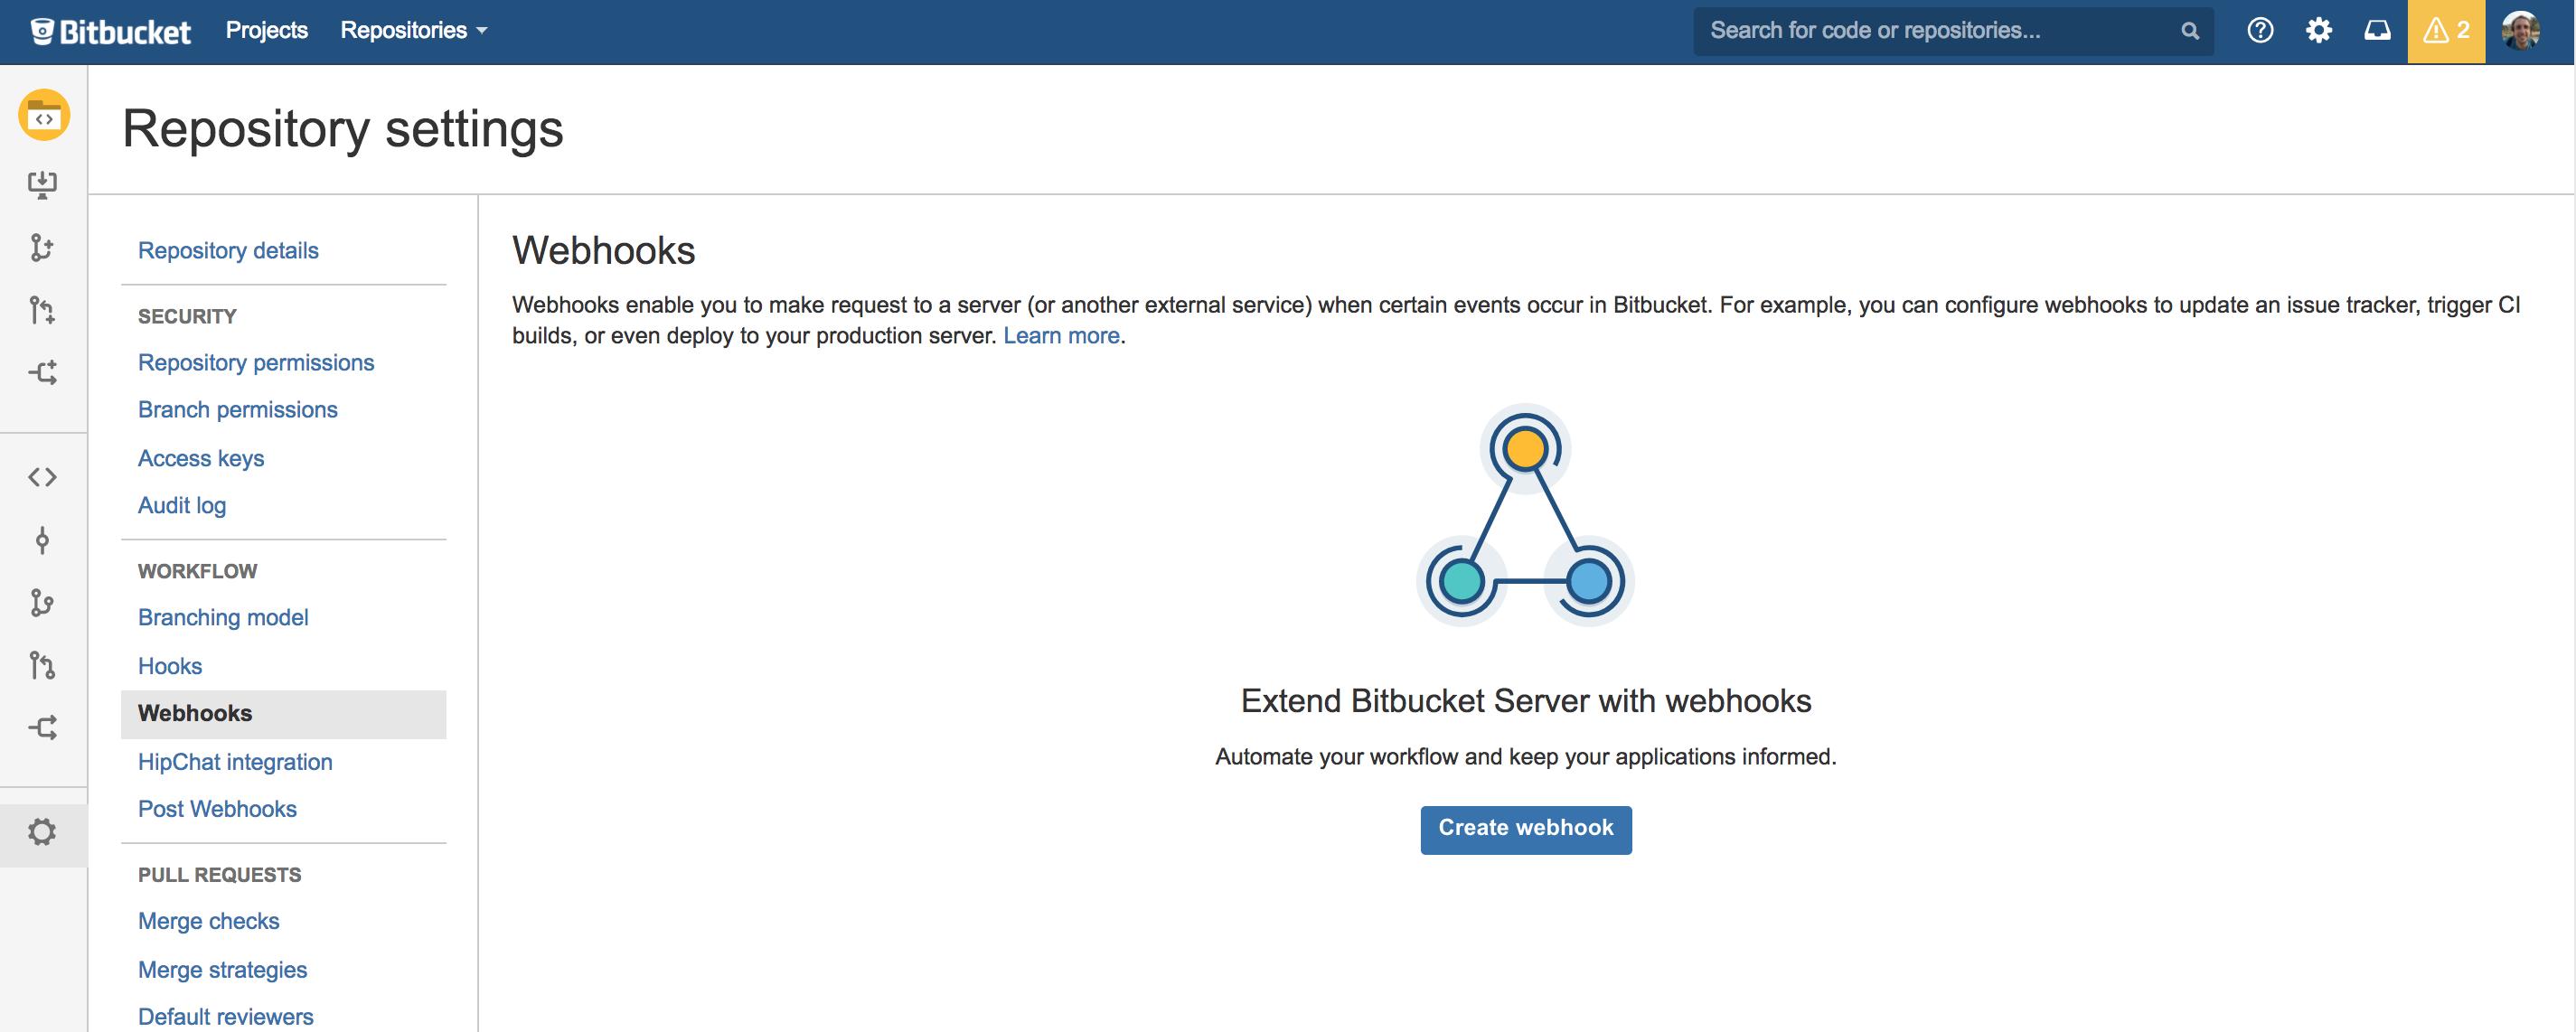 JENKINS-28877] Bitbucket Plugin unable to parse Bitbucket